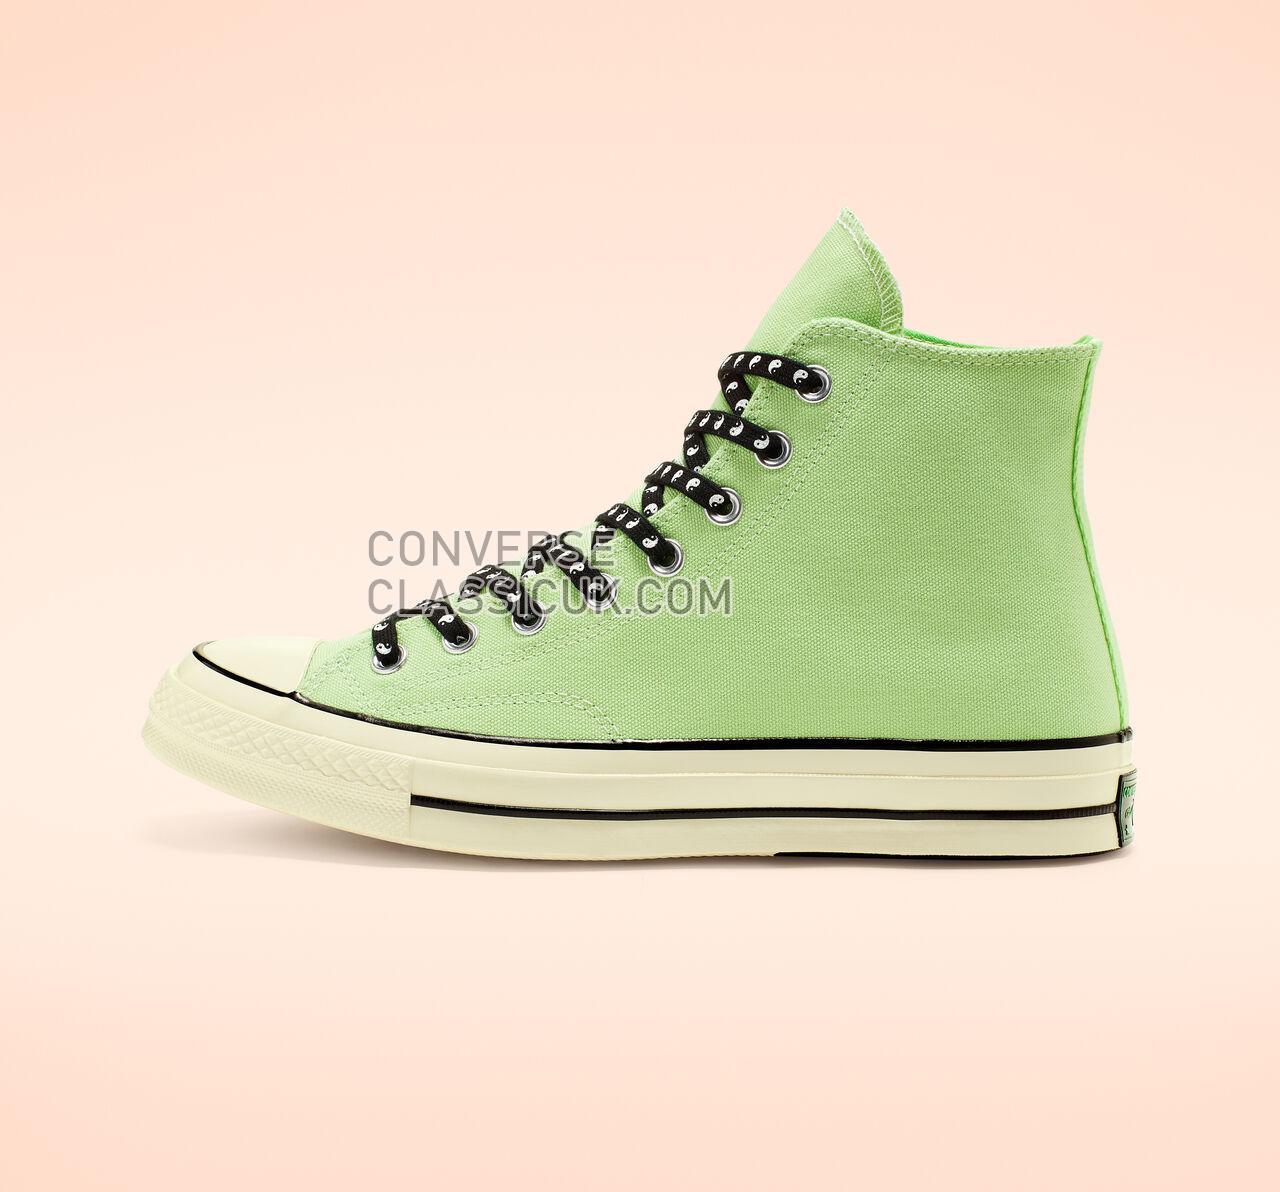 Converse Psy-Kicks Chuck 70 Womens 164210C Aphid Green/Black/Egret Shoes